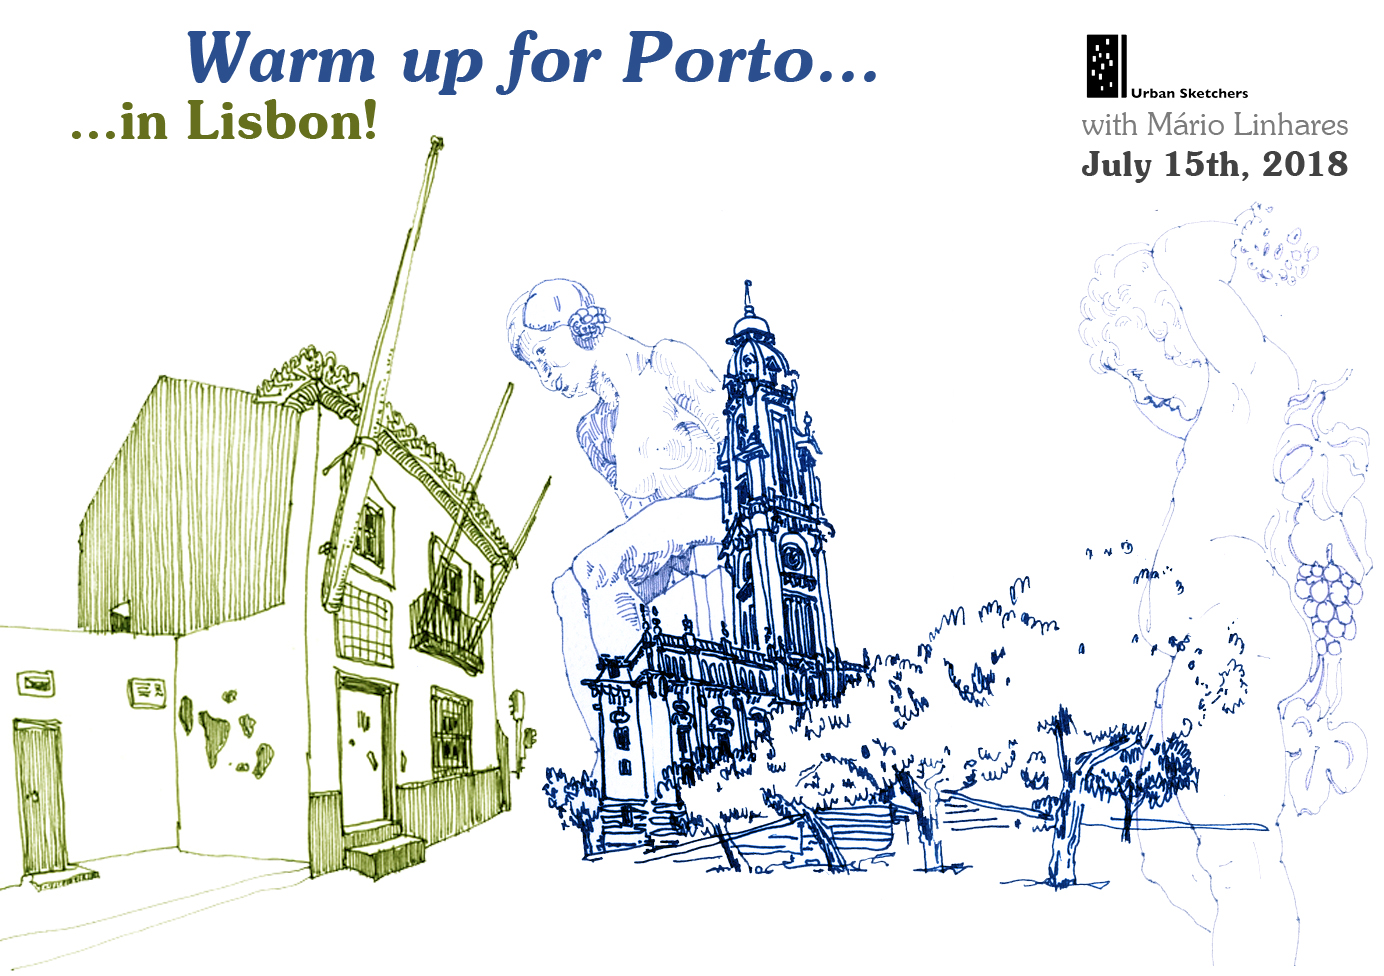 Porta Tv Brest.Warm Up For Porto In Lisbon Urban Sketchers